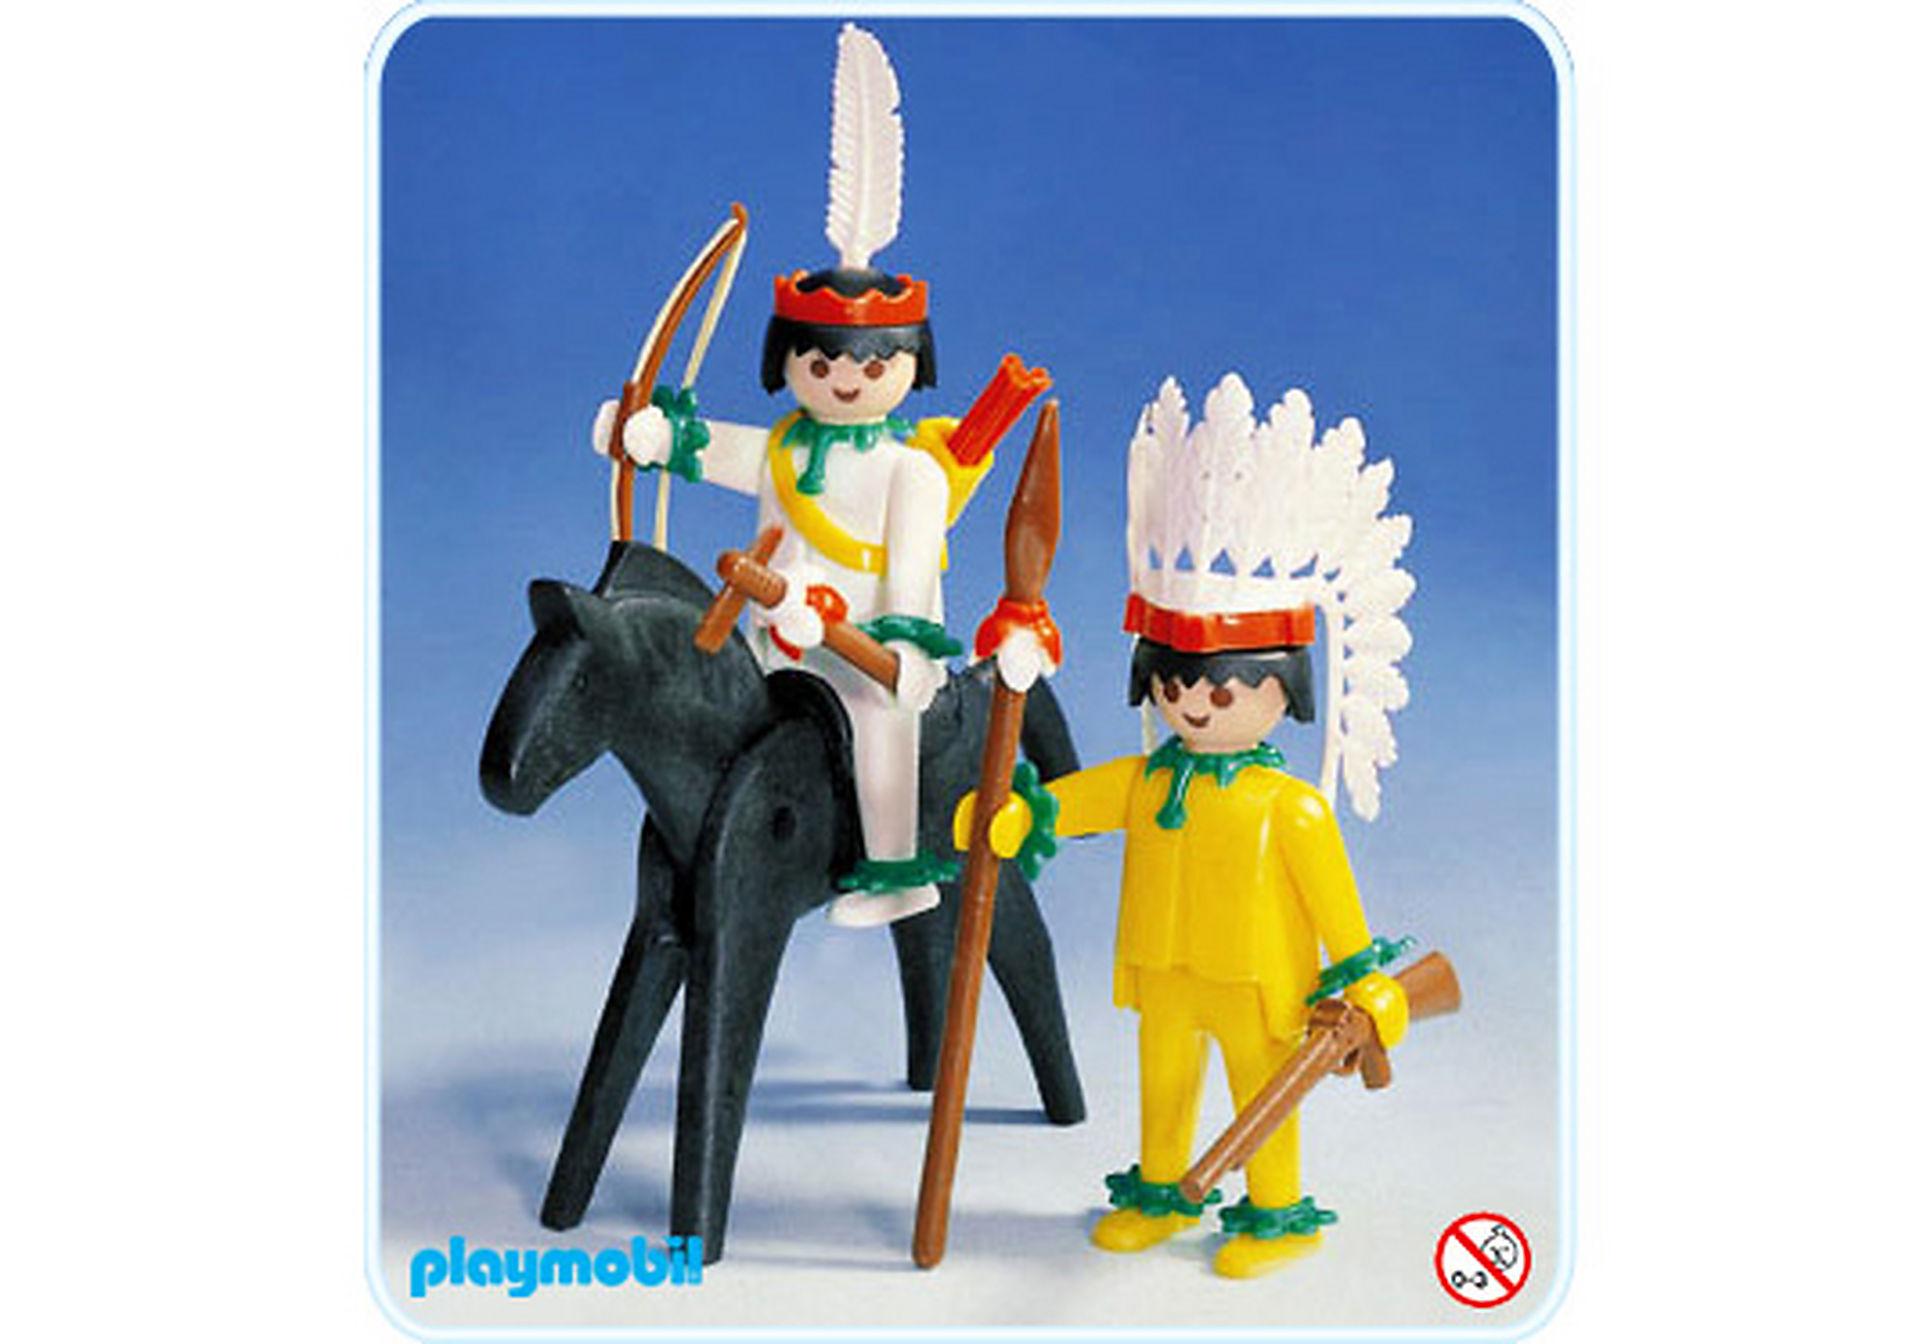 http://media.playmobil.com/i/playmobil/3580-A_product_detail/Häuptling/Krieger